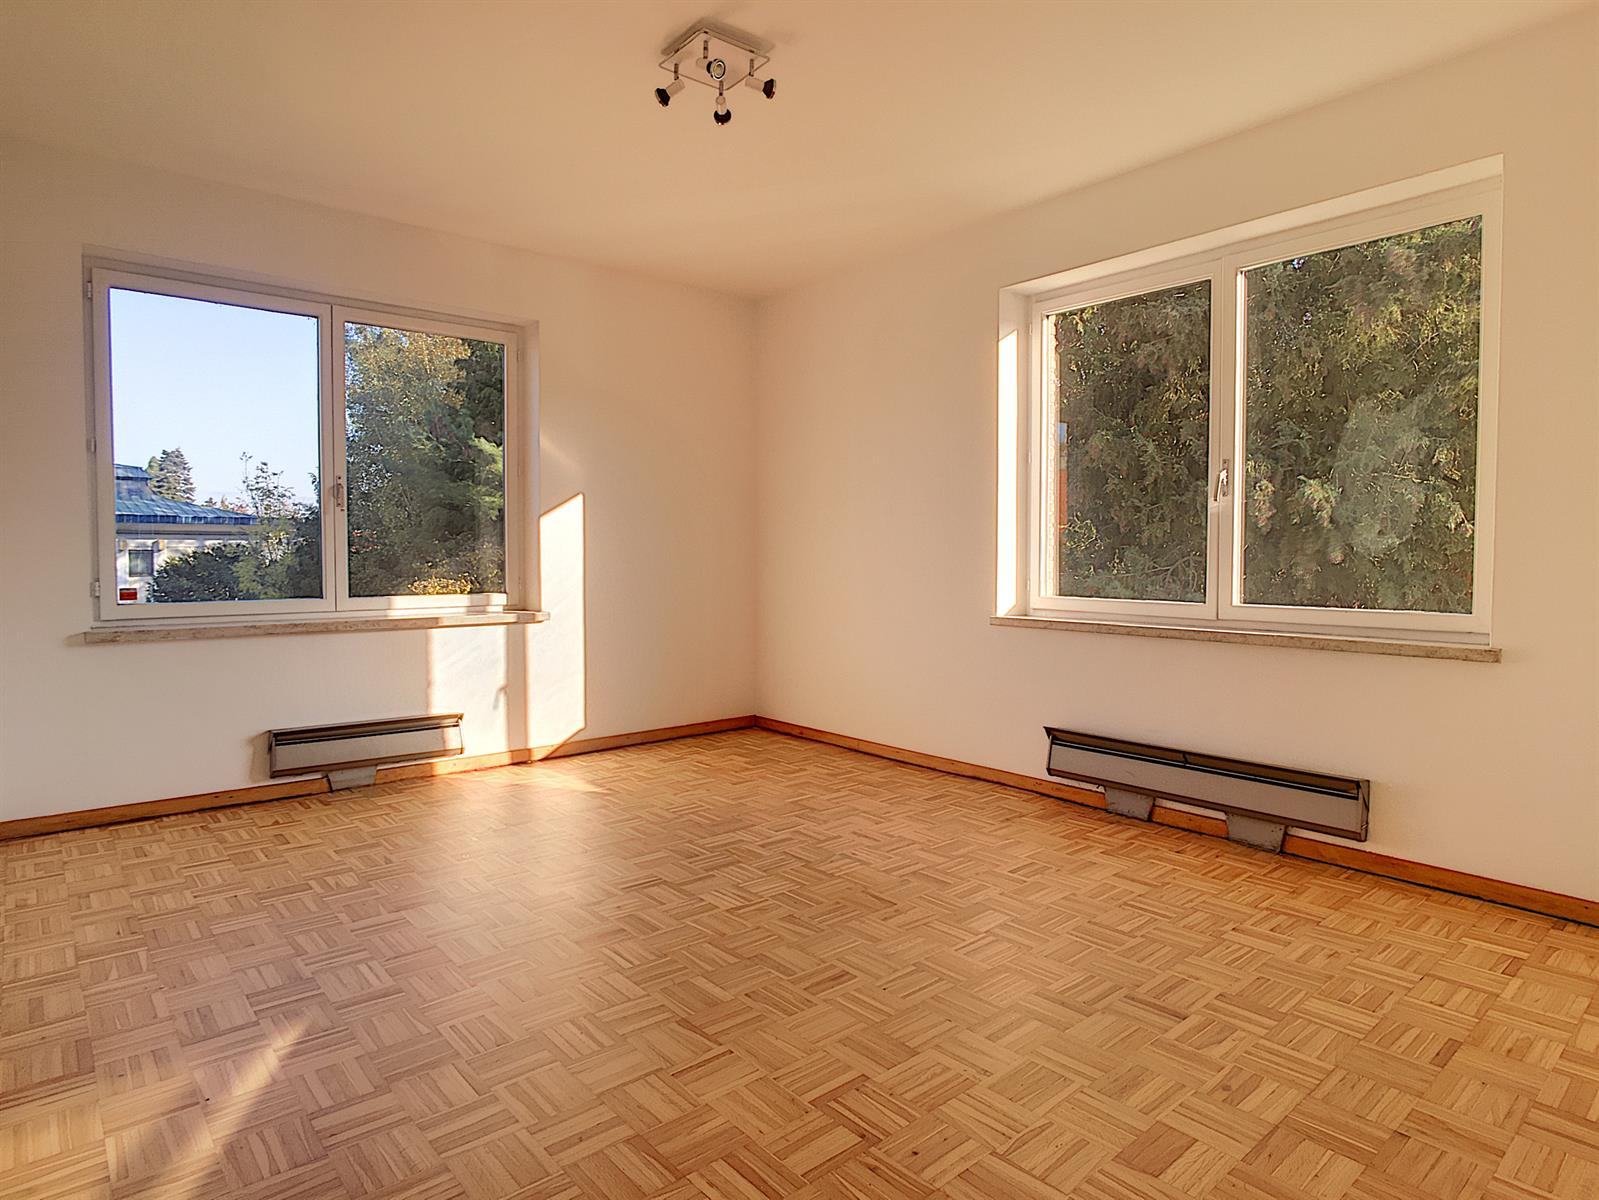 Flat - Auderghem - #4197560-5